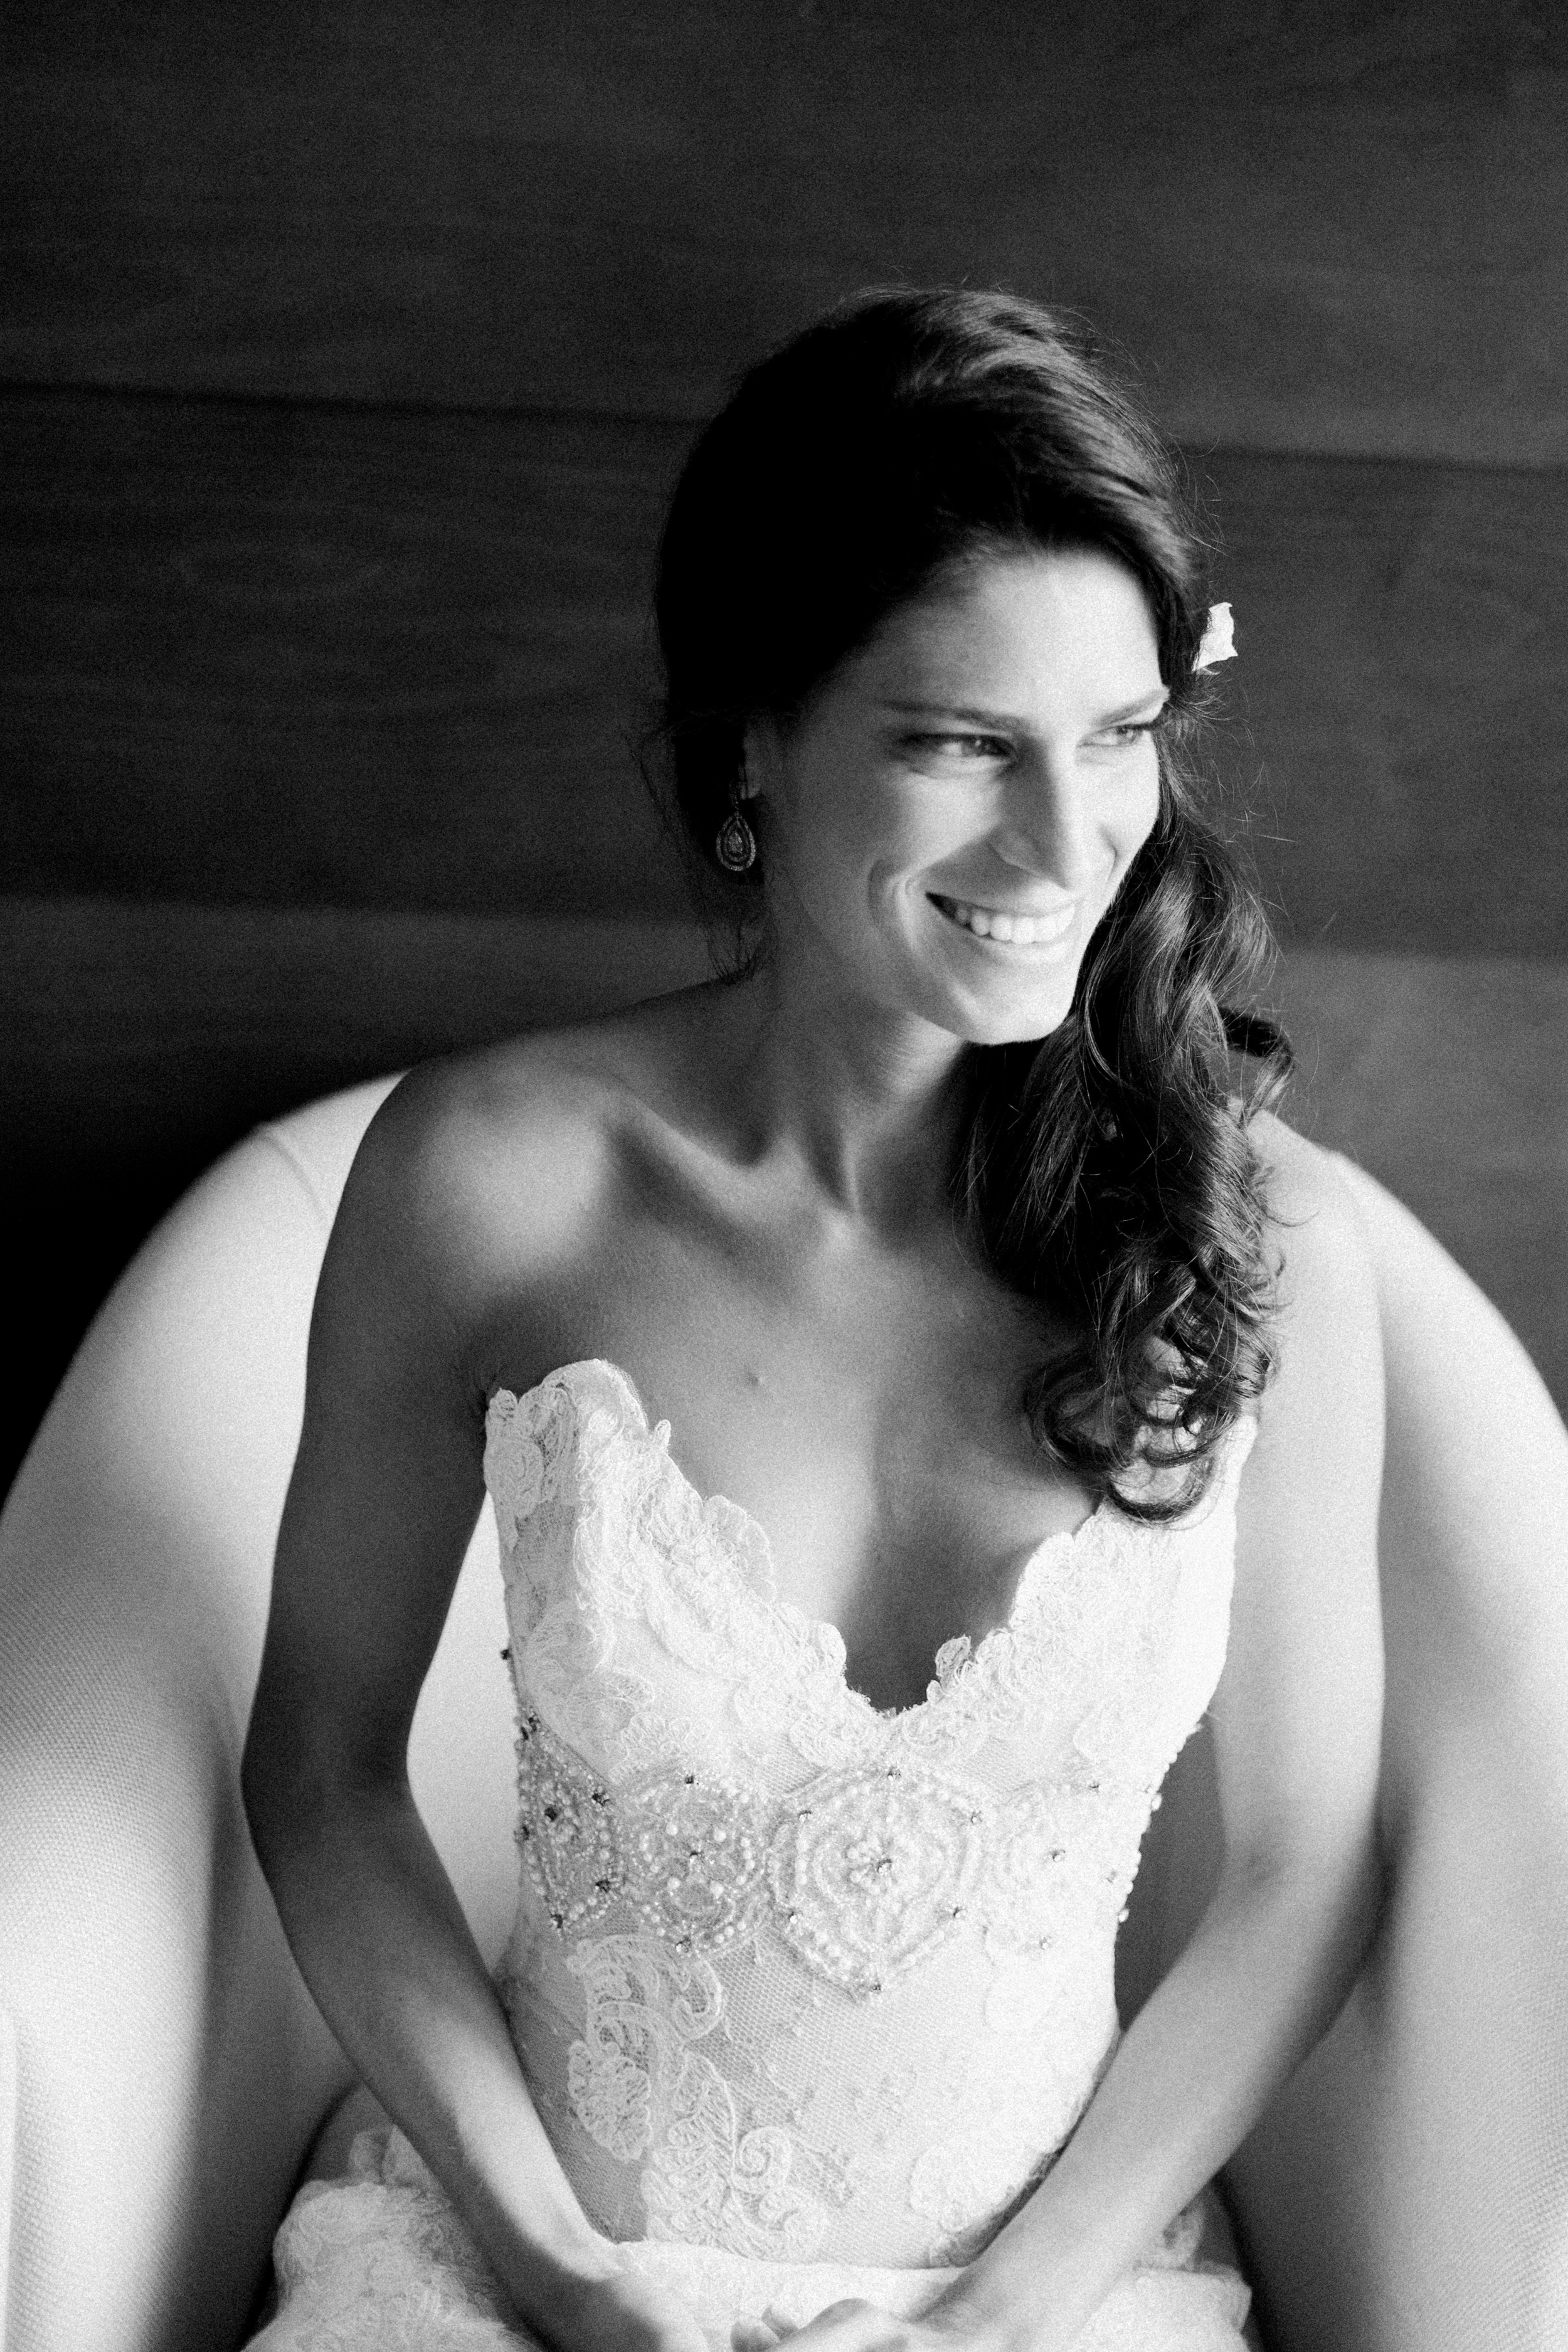 mariarao+wedding+quinta+del+carmen-78.jpg